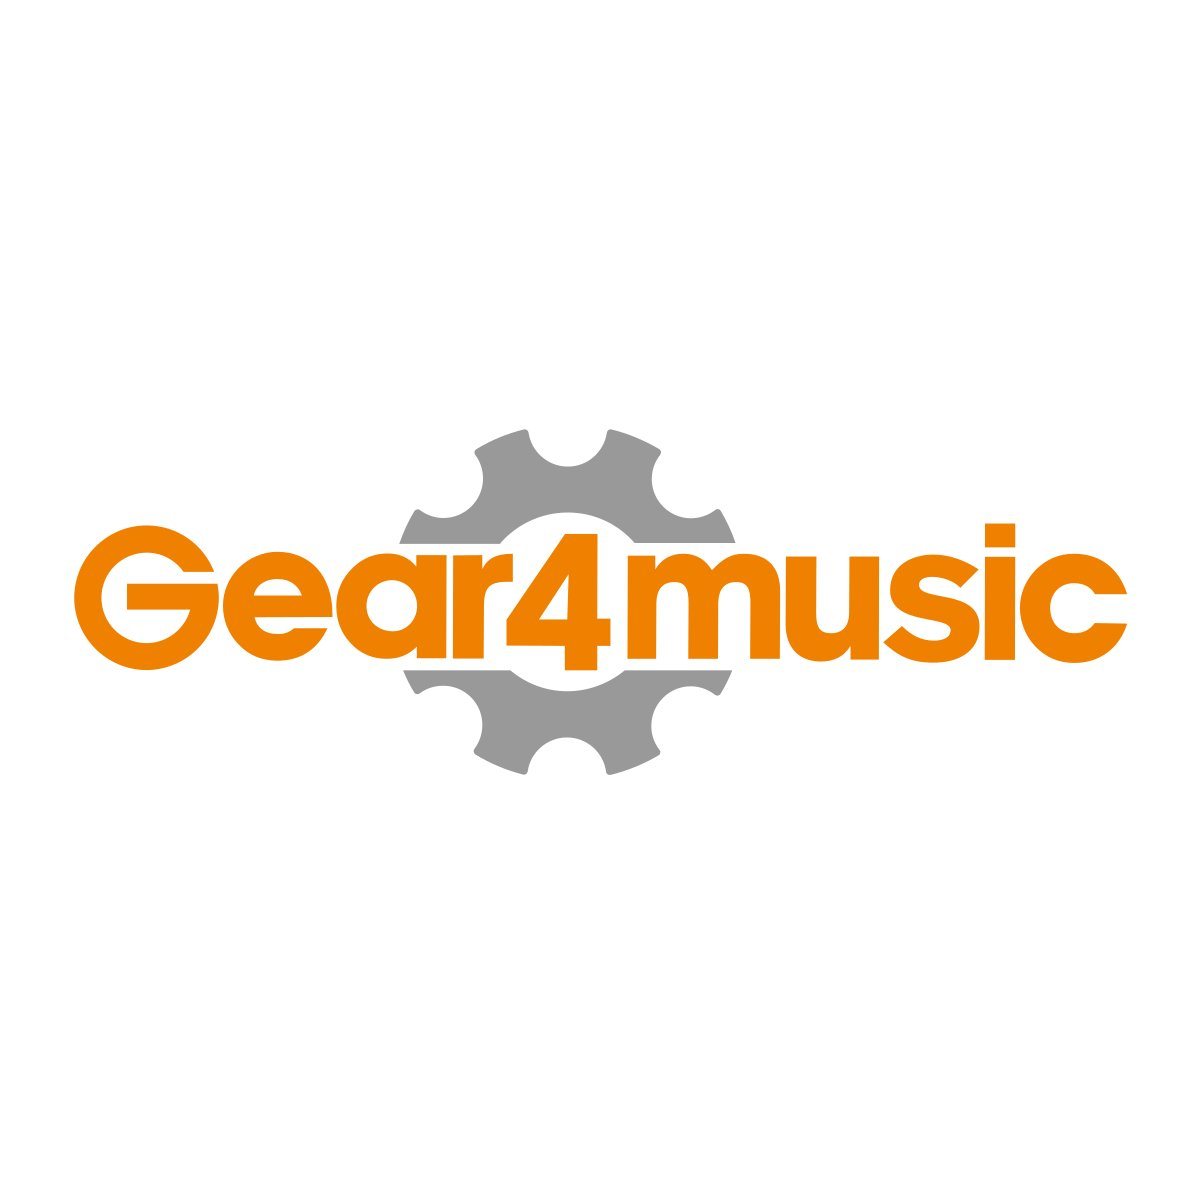 Bas Basun lige Mute fra Gear4music